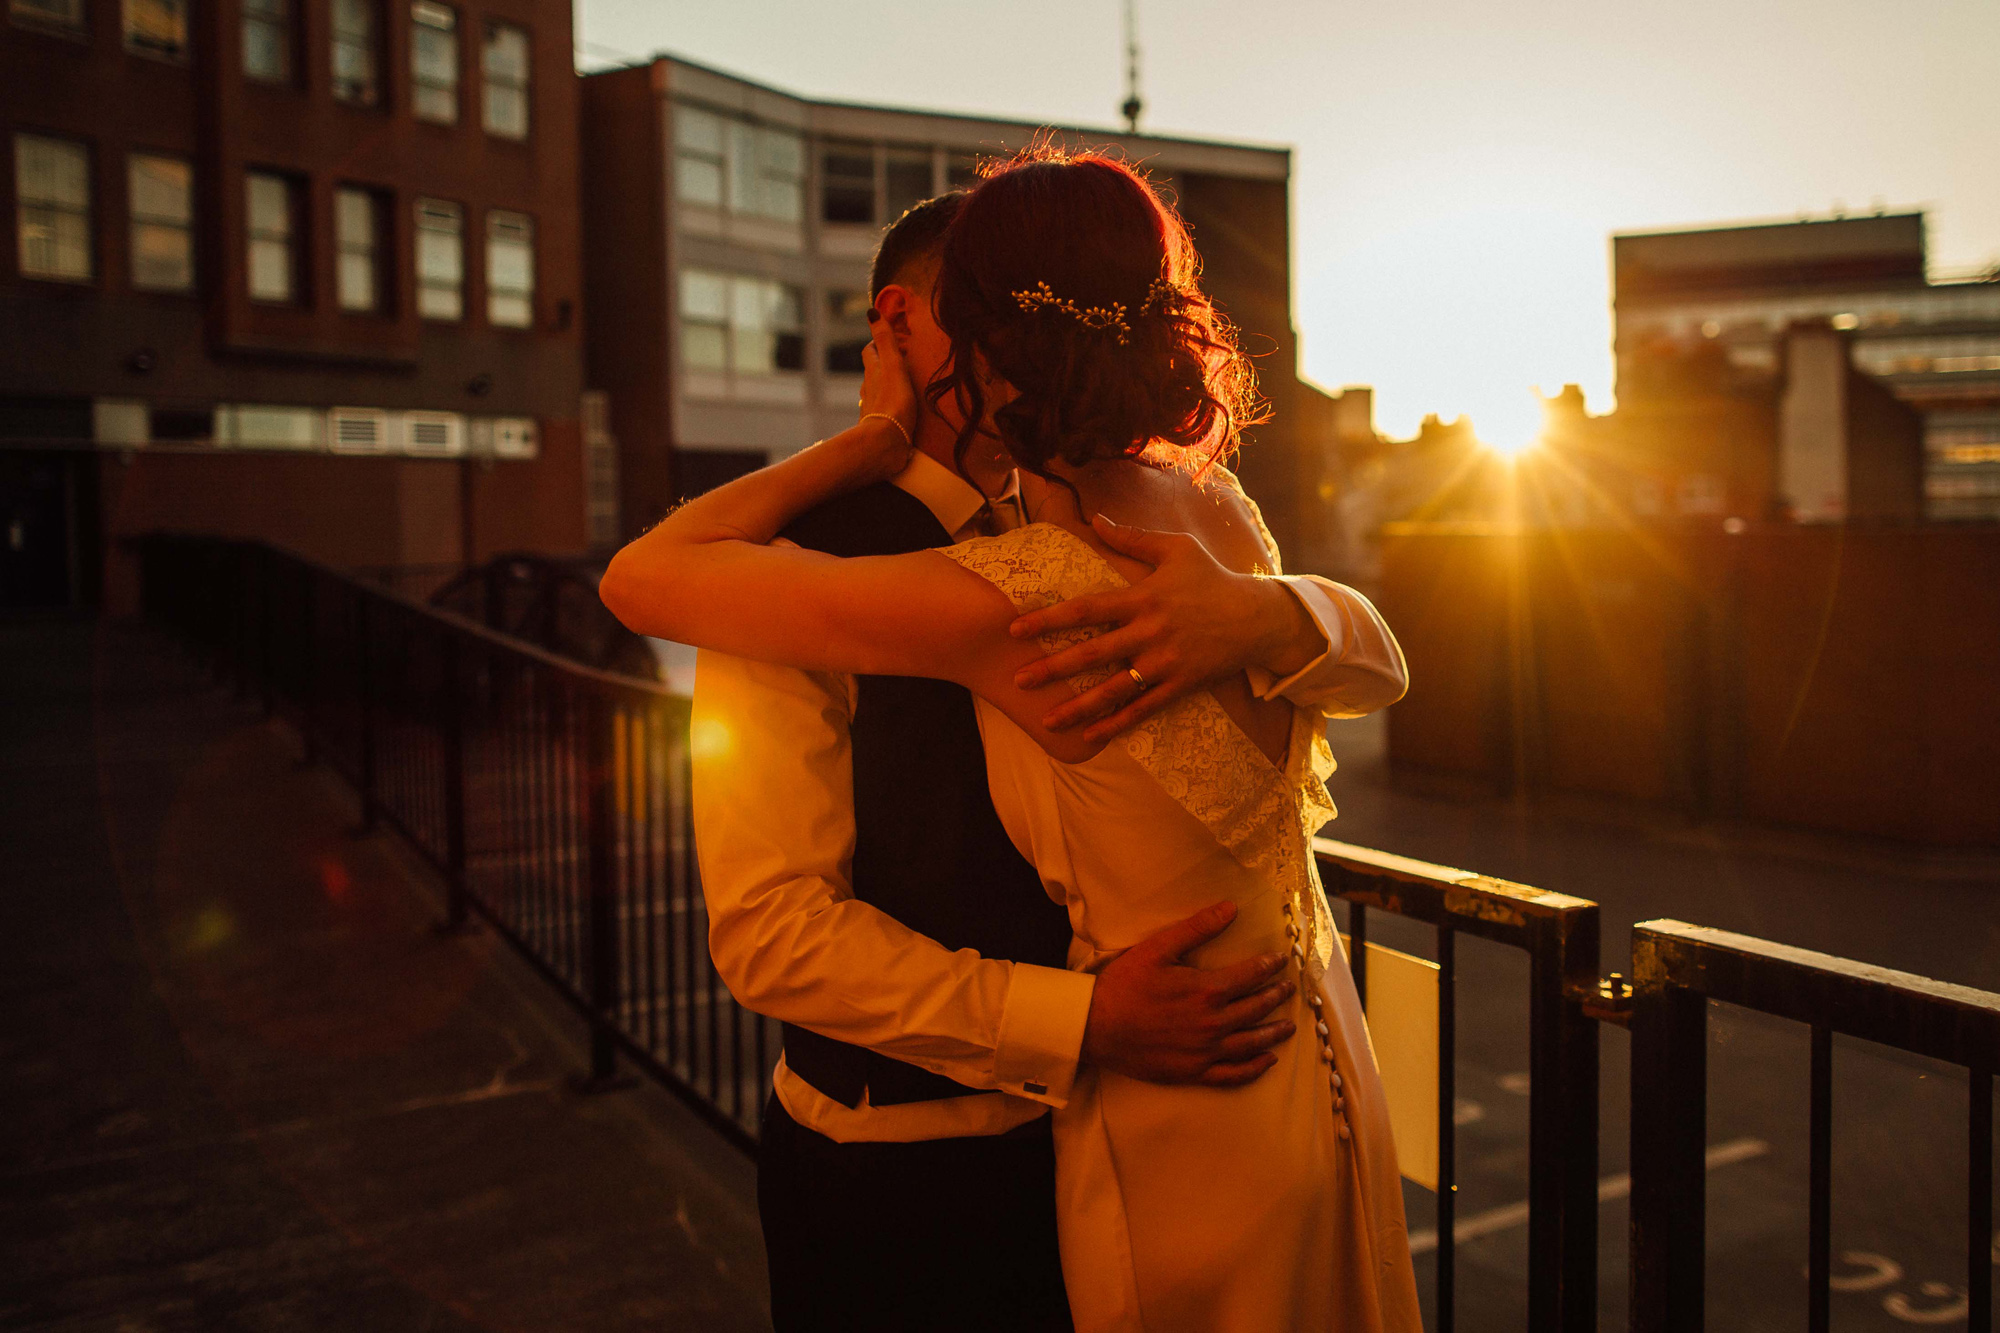 Sarah-Honeysuckle-Bias-Cut-Silk-Vintage-Inspired-Wedding-Gown-Sheffield-Wedding-Kate-Beaumont-63.jpg